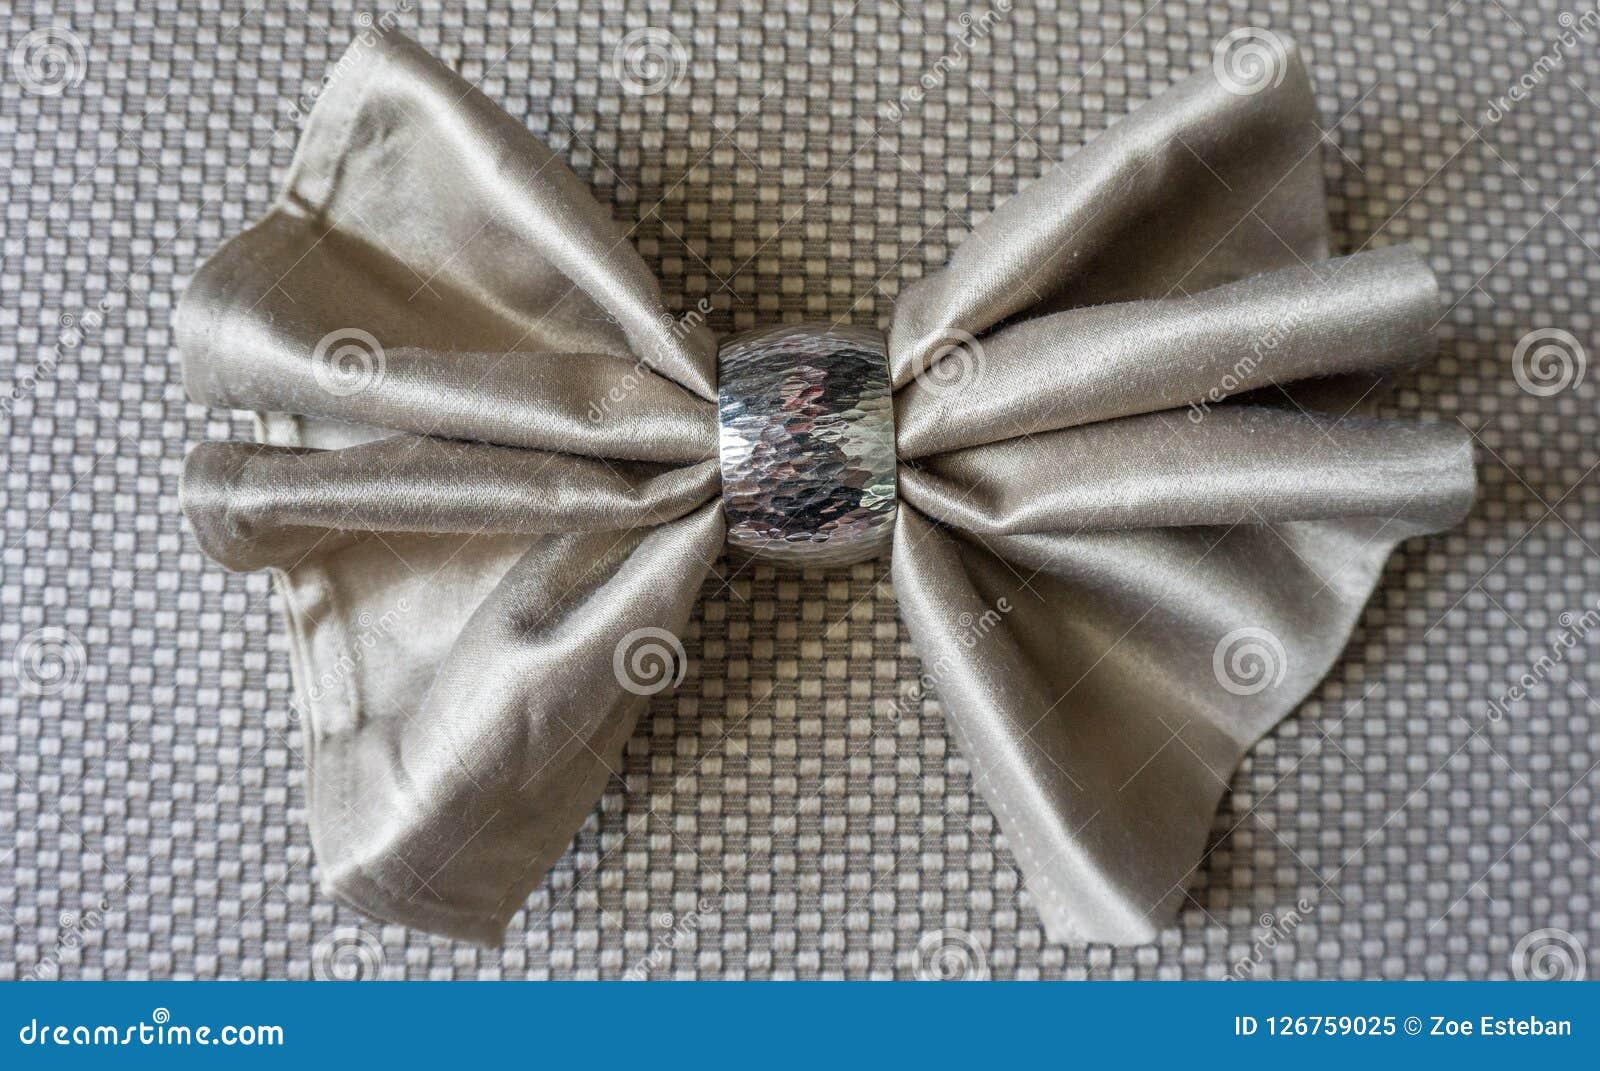 290 Napkin Folding Photos Free Royalty Free Stock Photos From Dreamstime